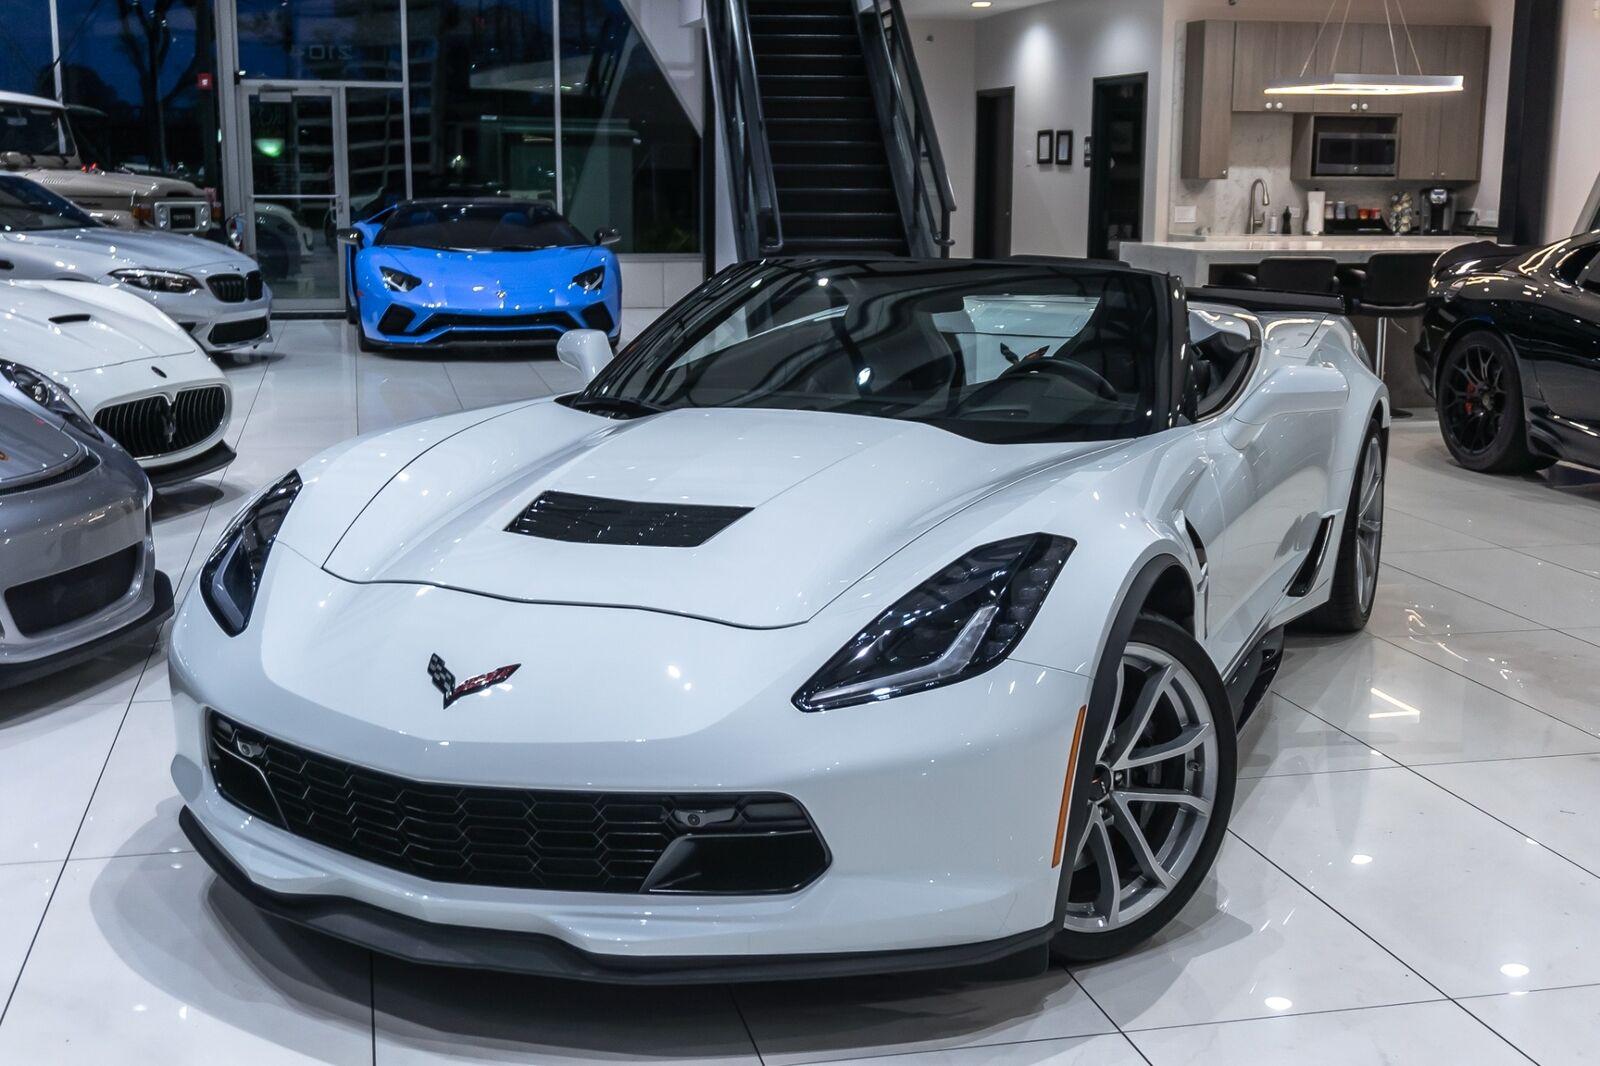 2019 White Chevrolet Corvette Convertible 2LT | C7 Corvette Photo 5